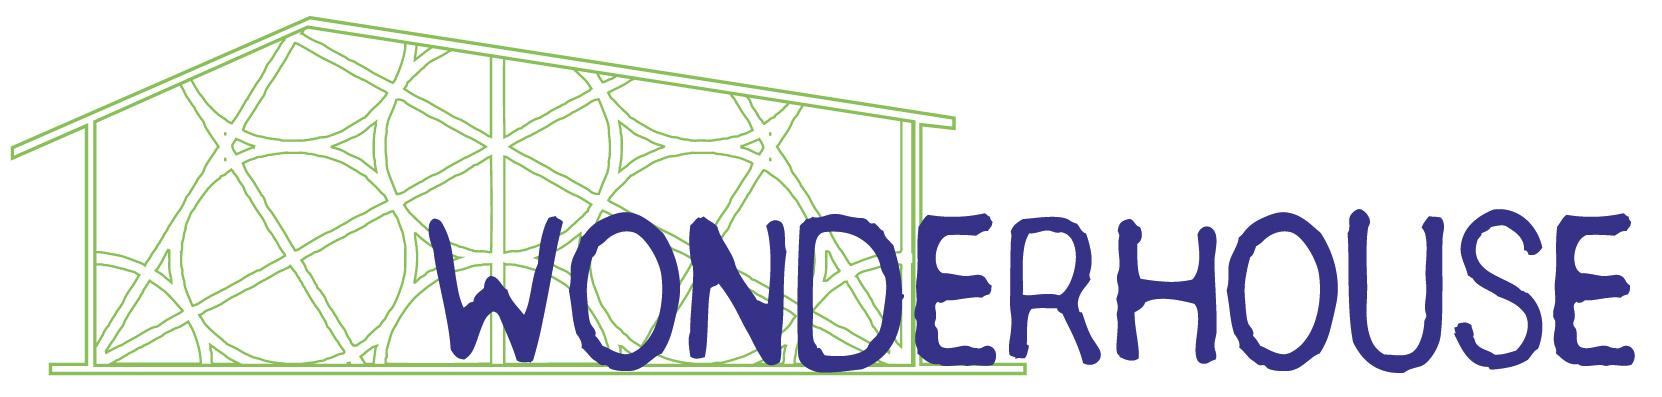 Wonderhouse